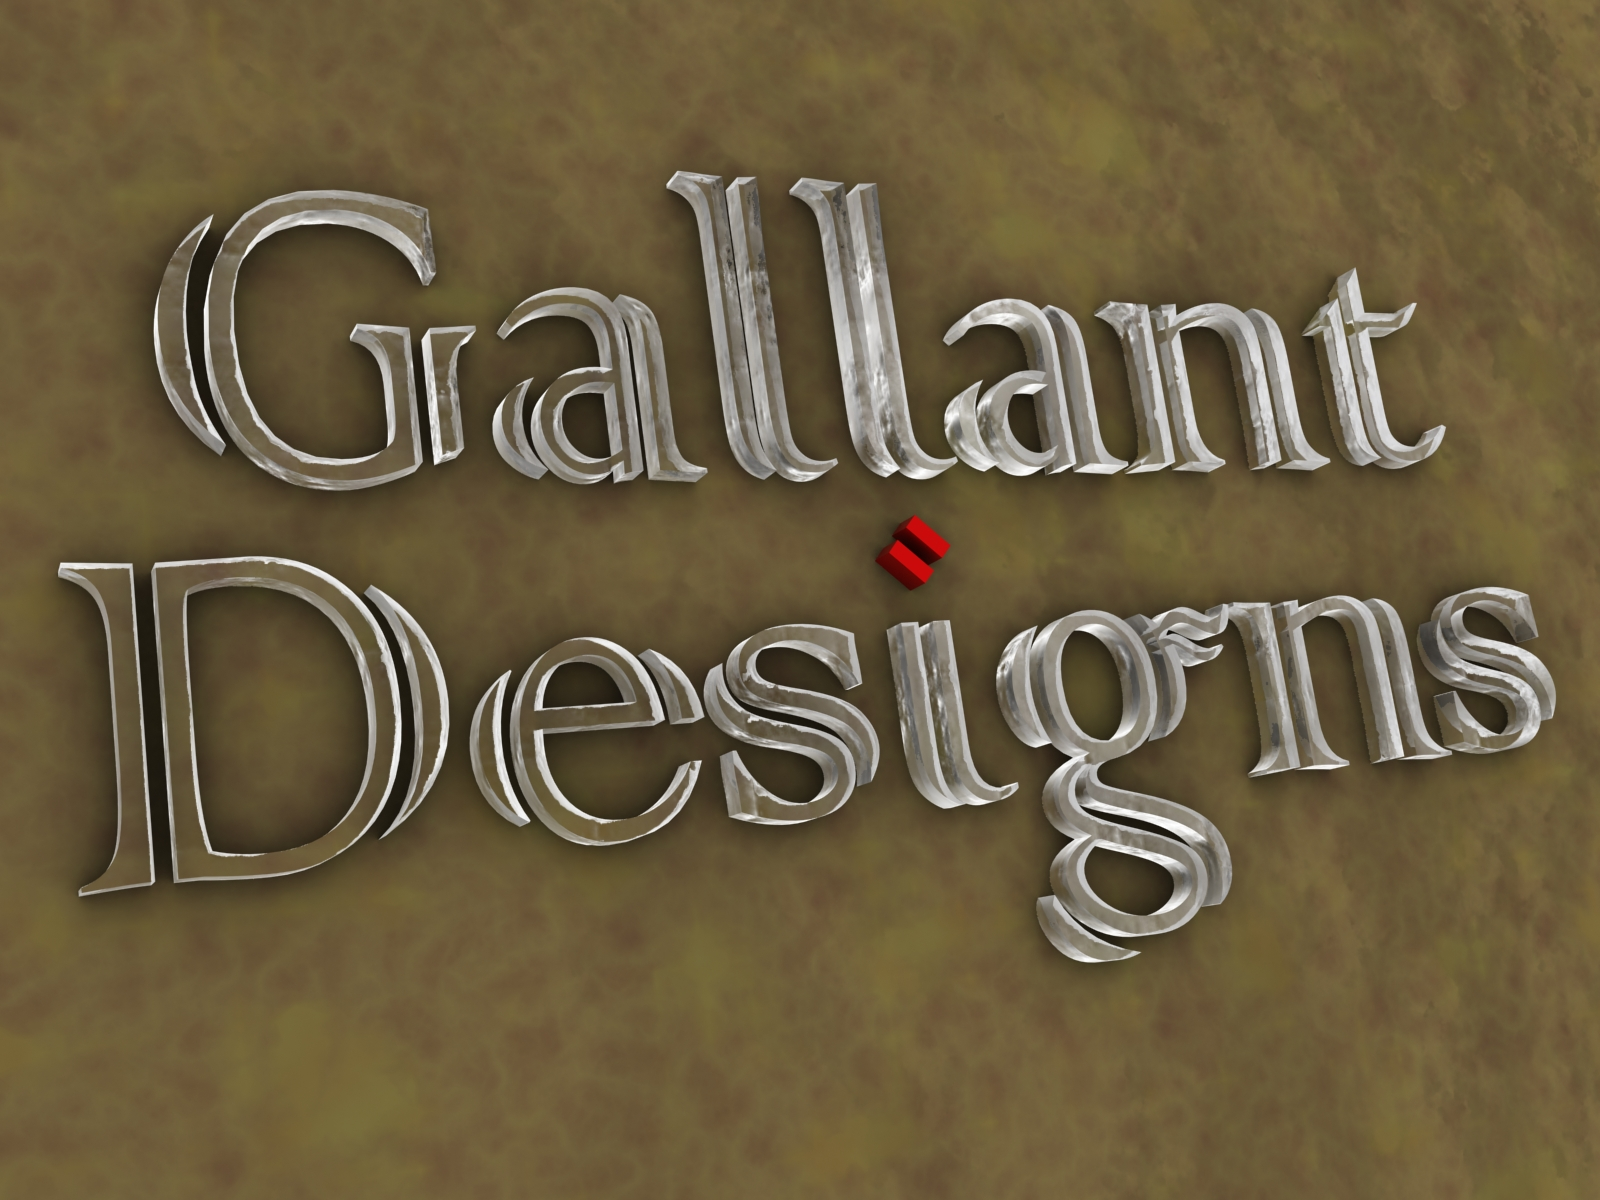 picture_GallantDesigns